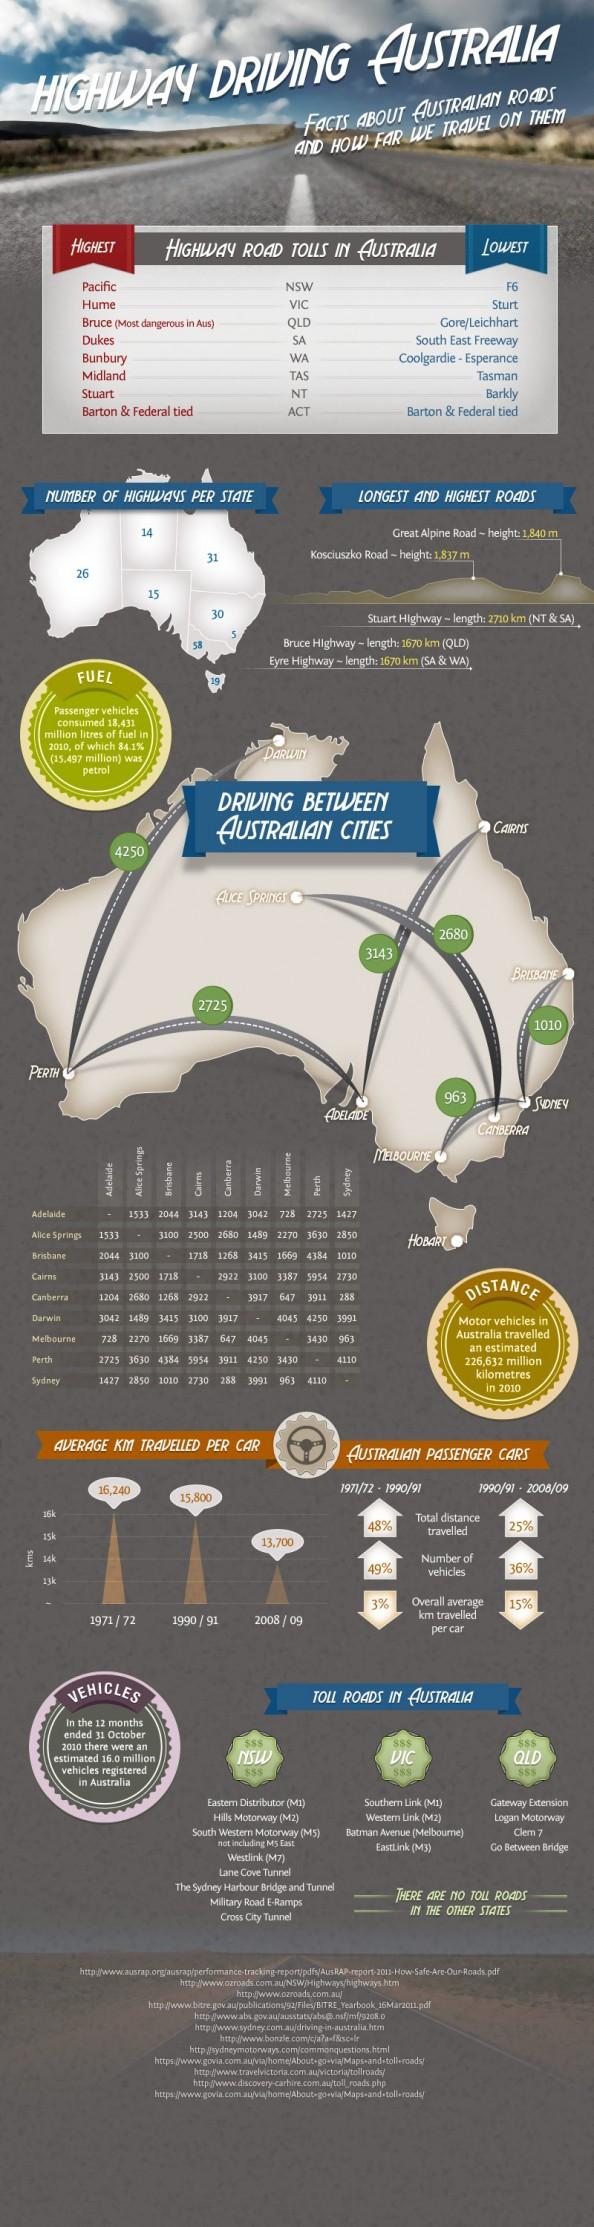 Driving Australian Highways Infographic